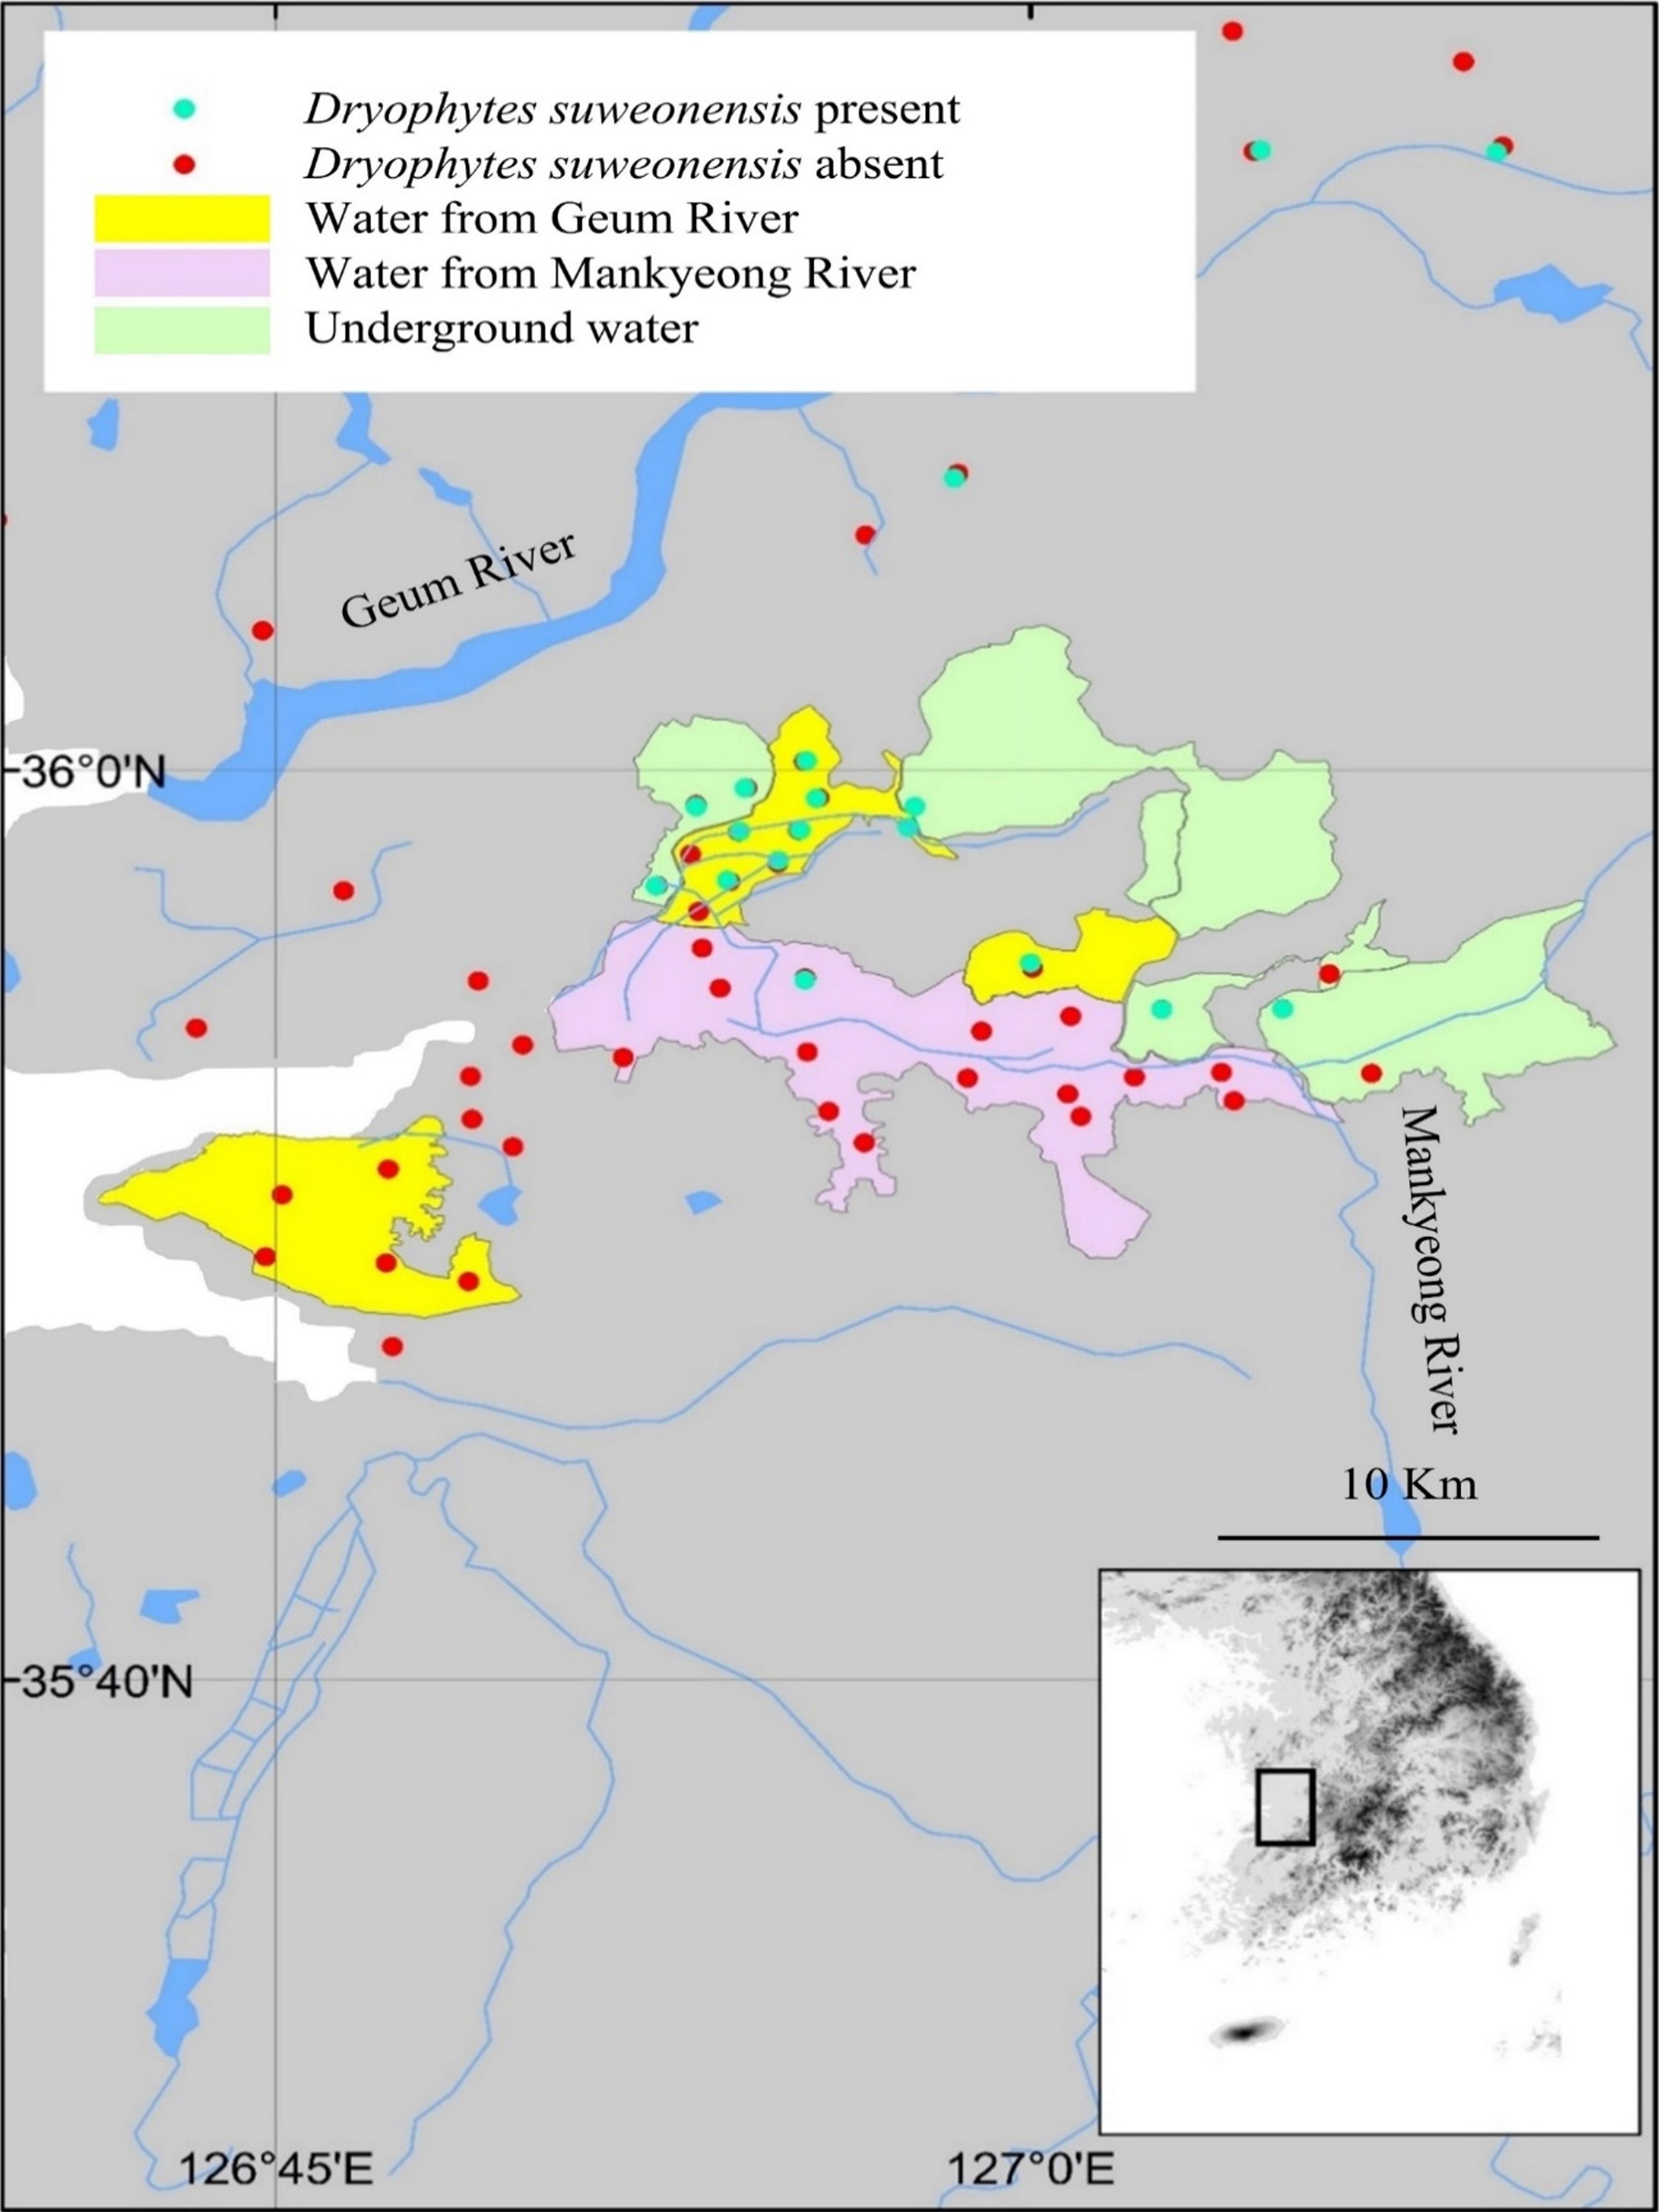 Maryland Biodiversity Project False Map france on map